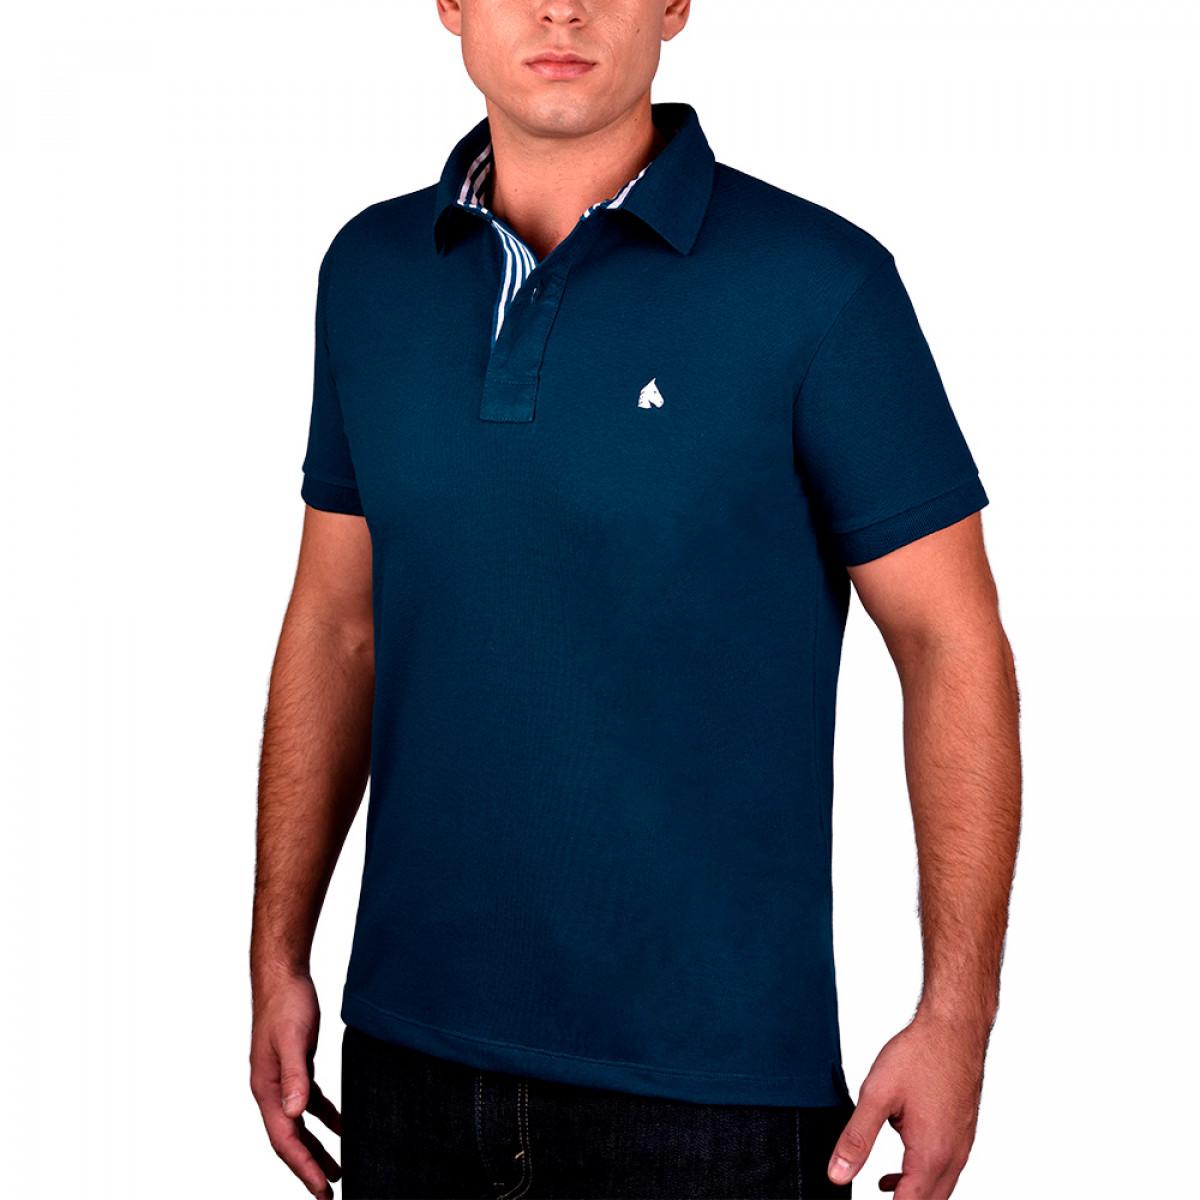 0d99297d9 Camisa Polo BF   MS Verde petróleo - BF   MS